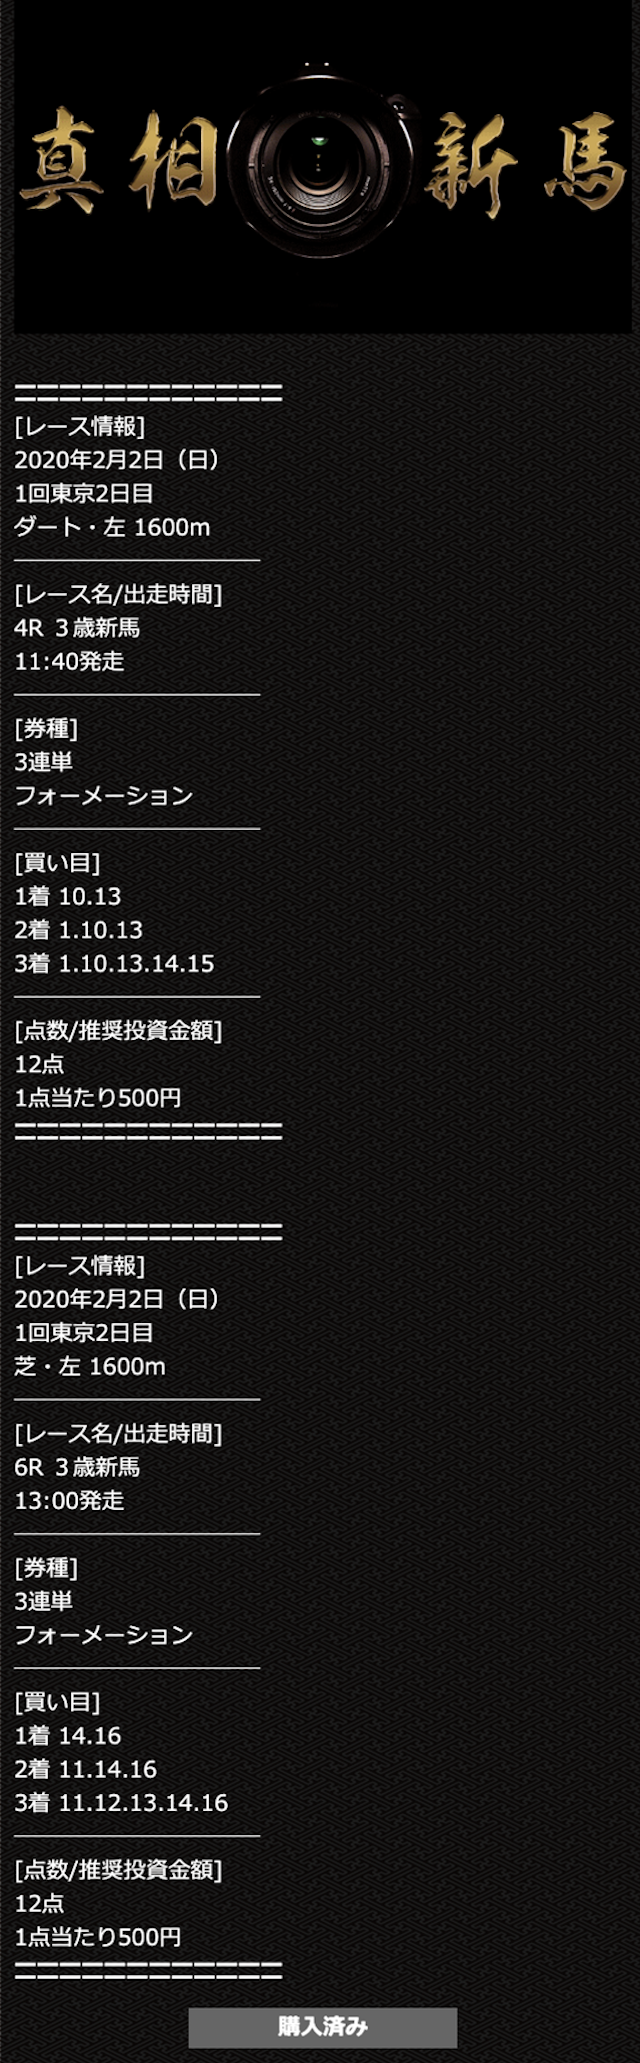 MUTEKI有料予想0202